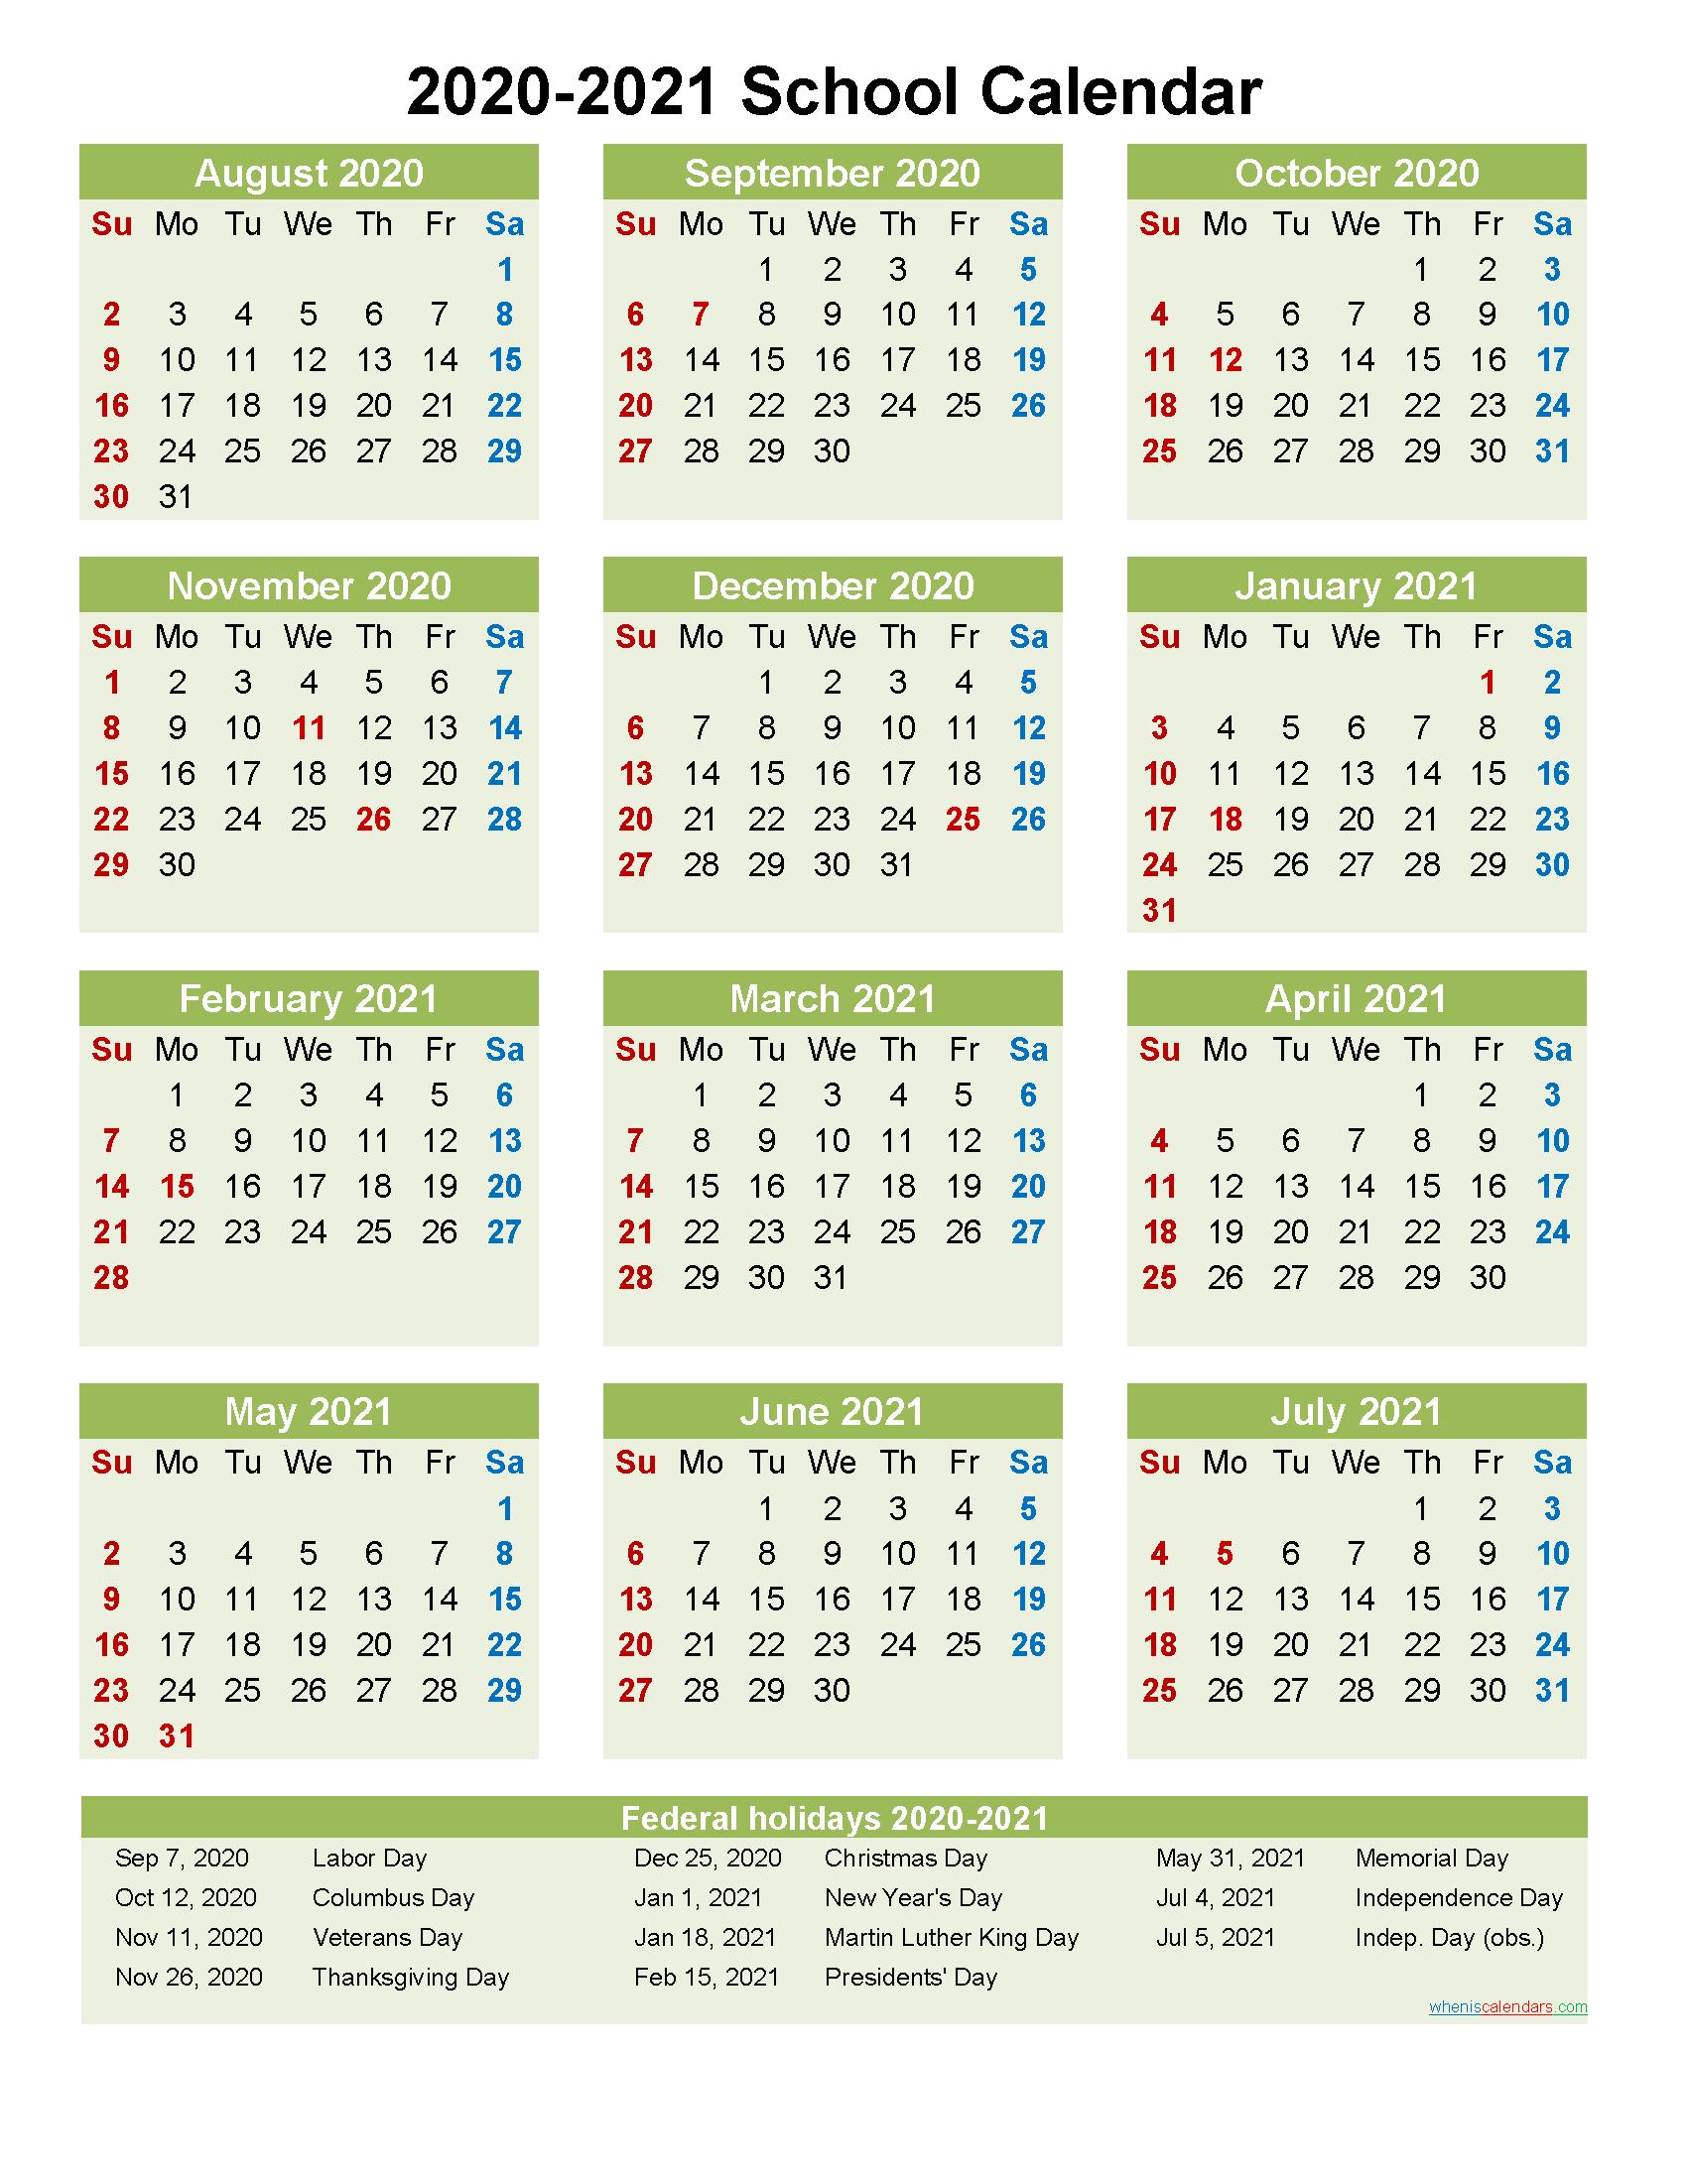 2020 and 2021 School Calendar Printable